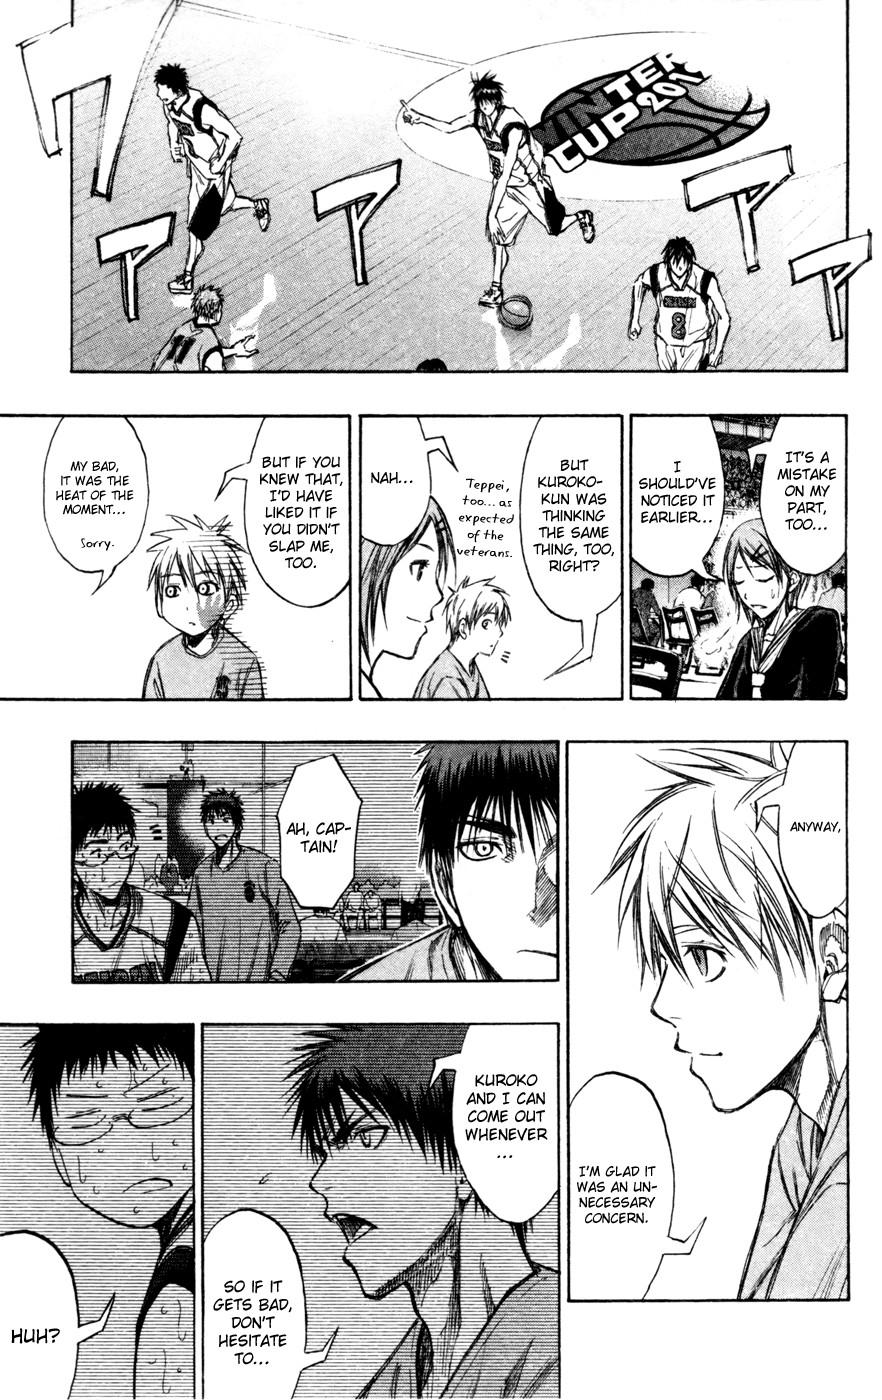 Kuroko no Basket Manga Chapter 143 - Image 13